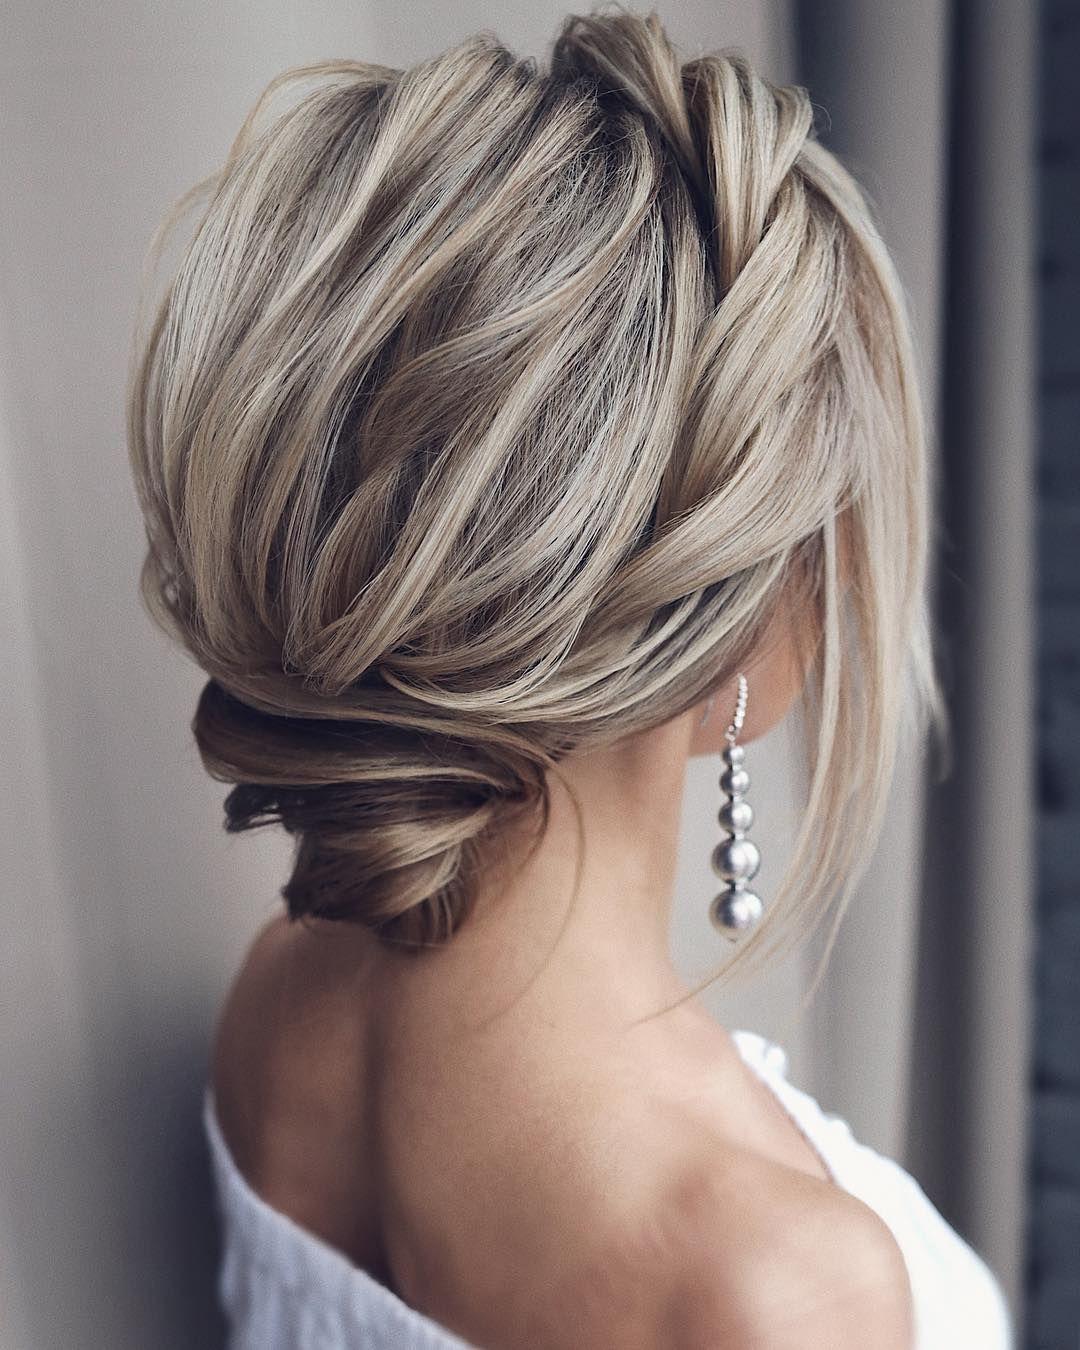 Tonyastylist Long Wedding Hairstyles And Wedding Updos Weddings Hairstyles Weddi Prom Hairstyles For Short Hair Medium Hair Styles Medium Length Hair Styles